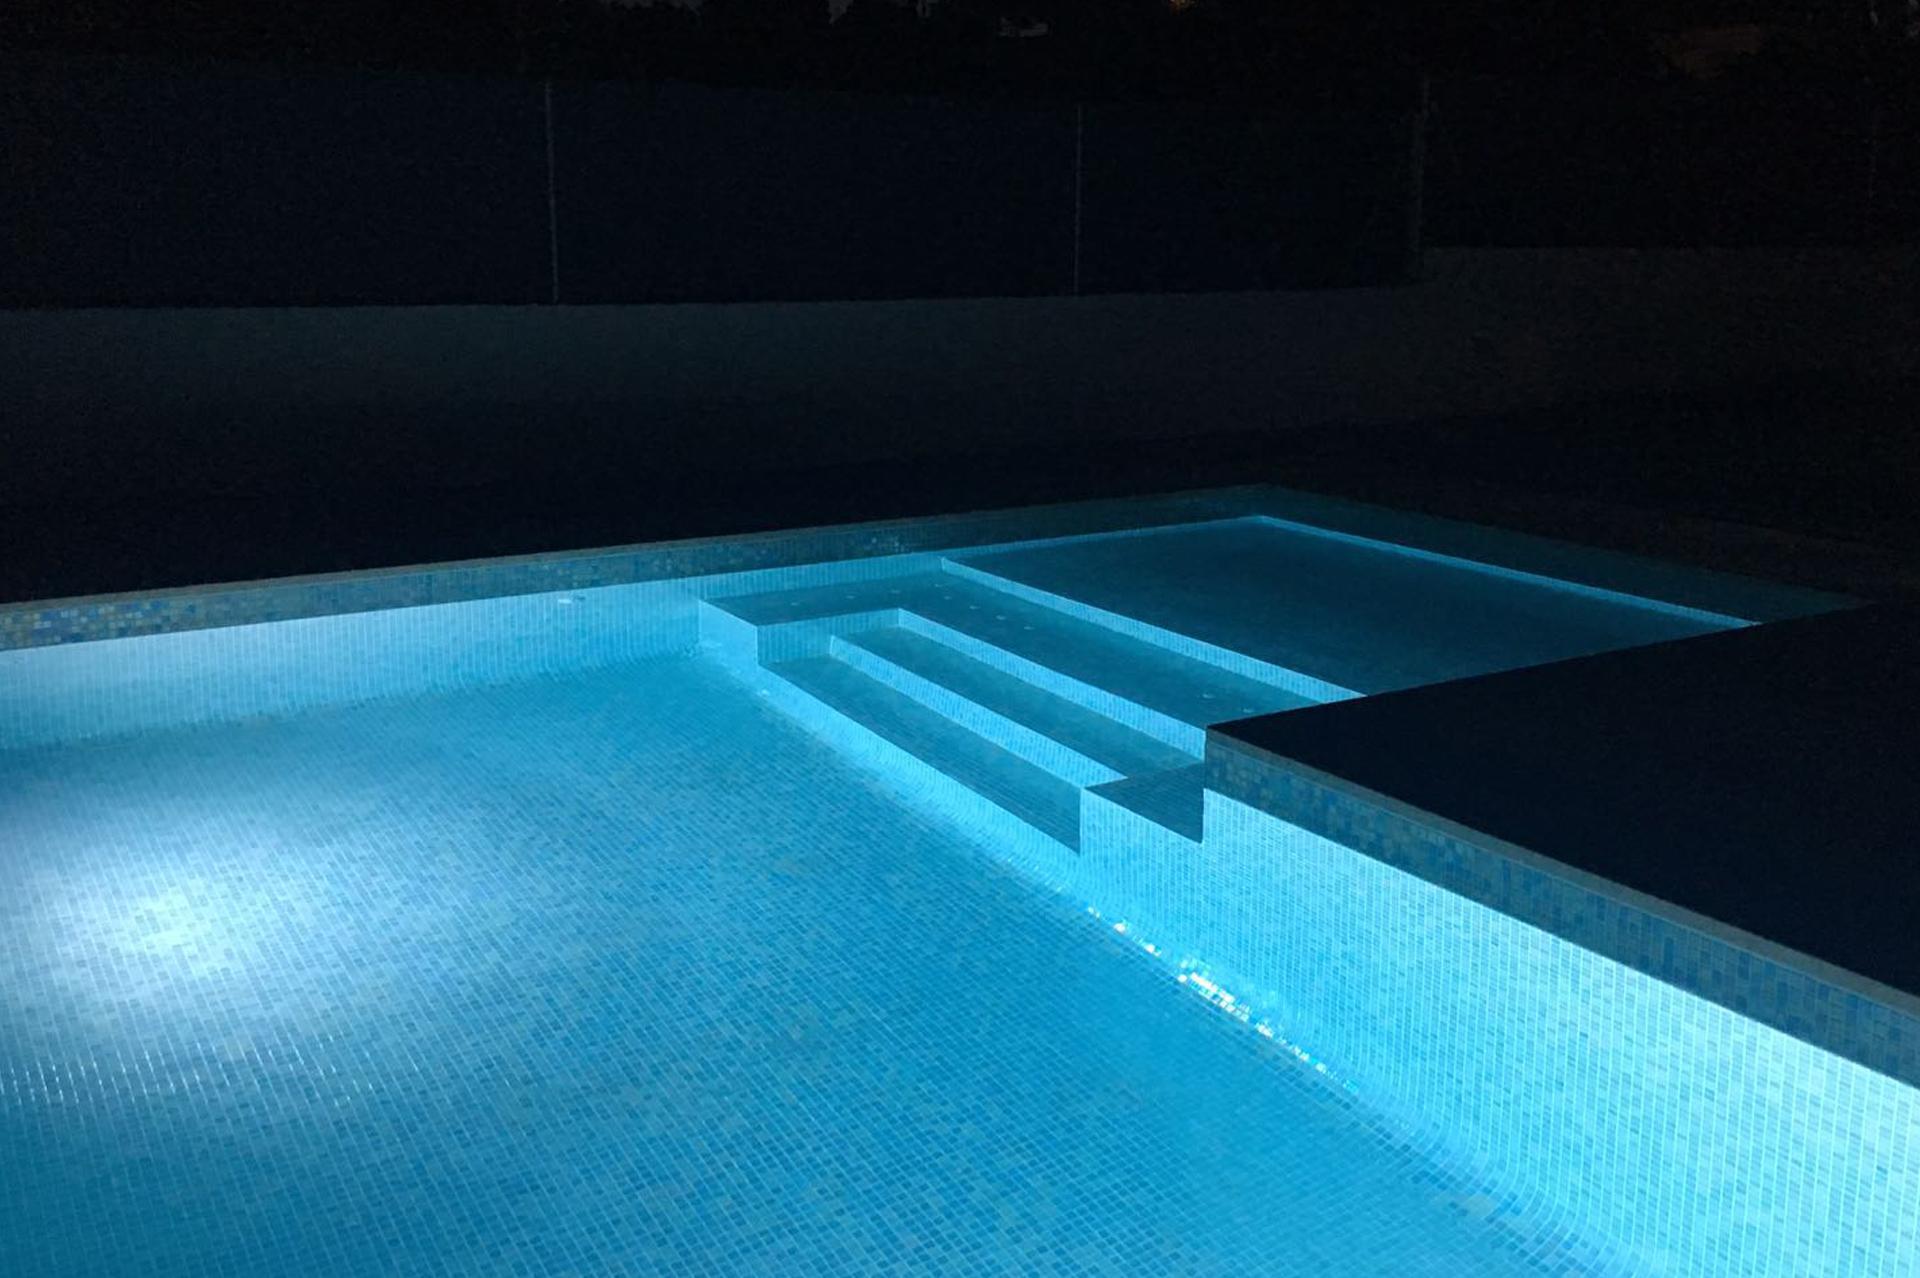 reforma_piscina_1_5